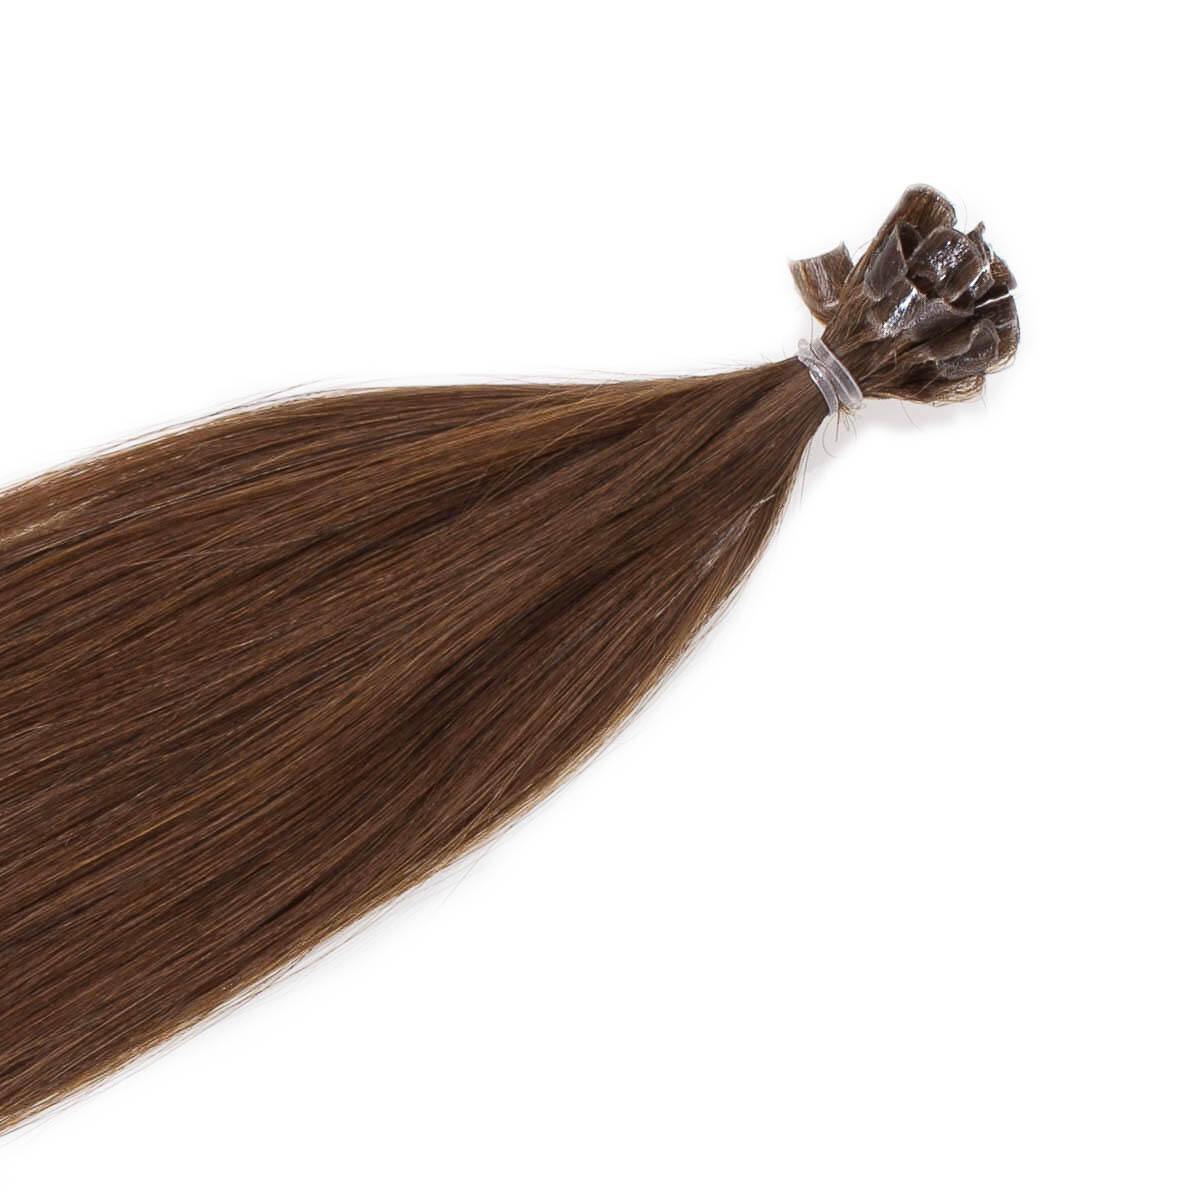 Nail Hair Original 5.0 Brown 50 cm